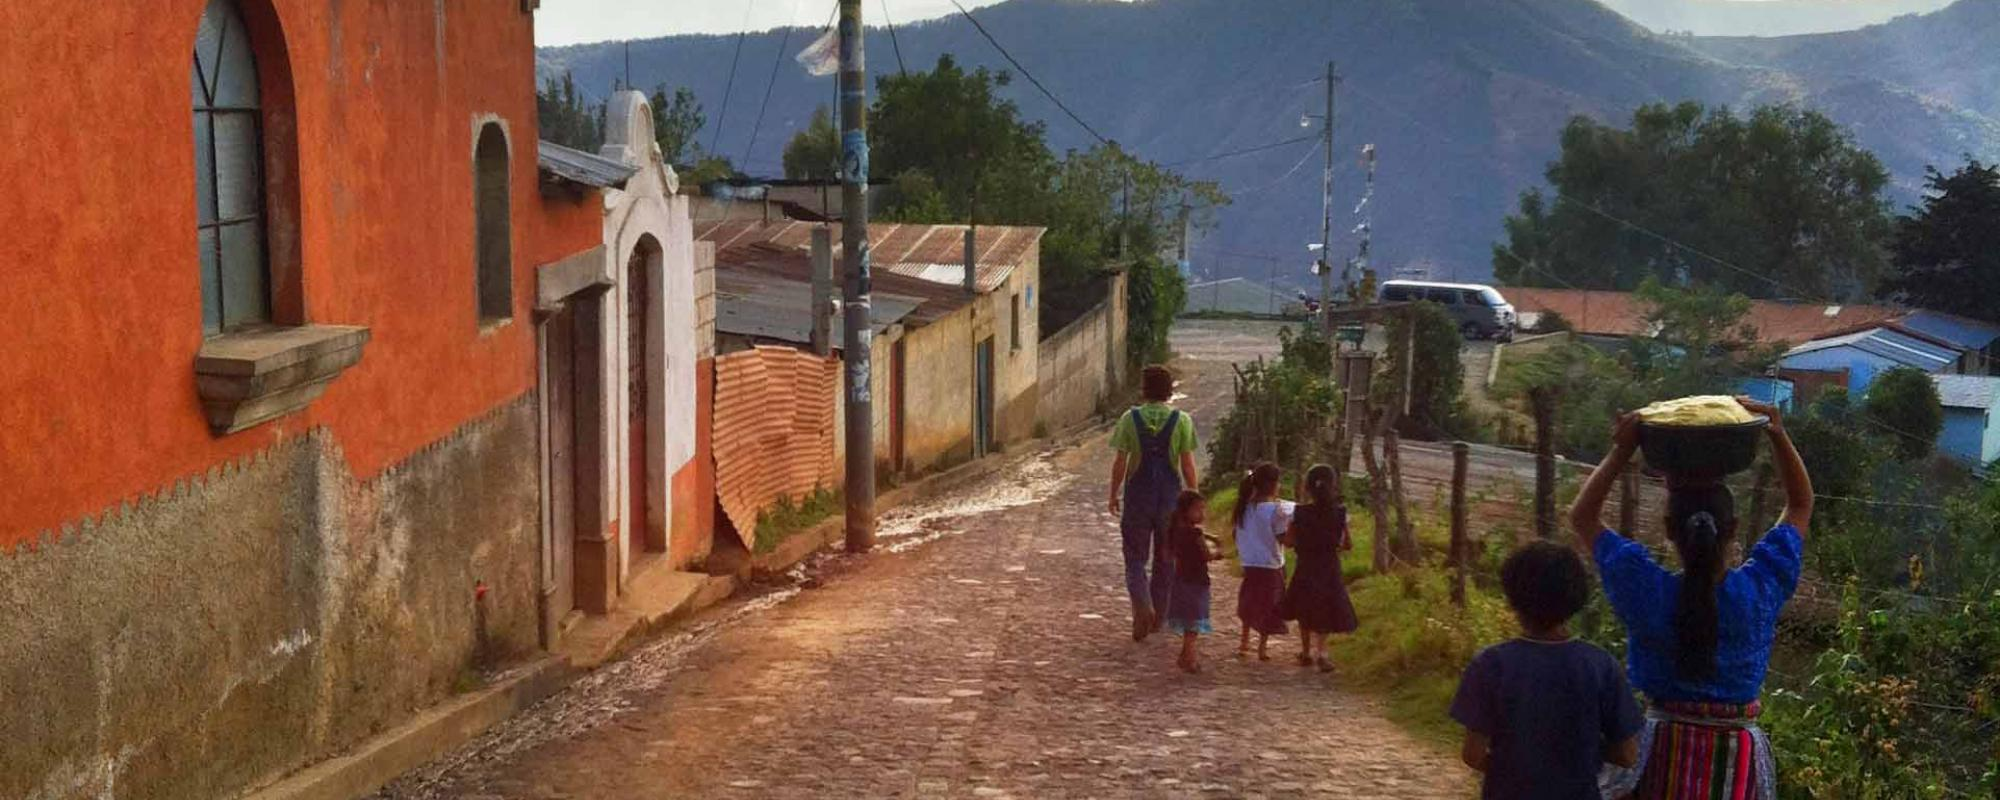 People in Guatemala carrying water